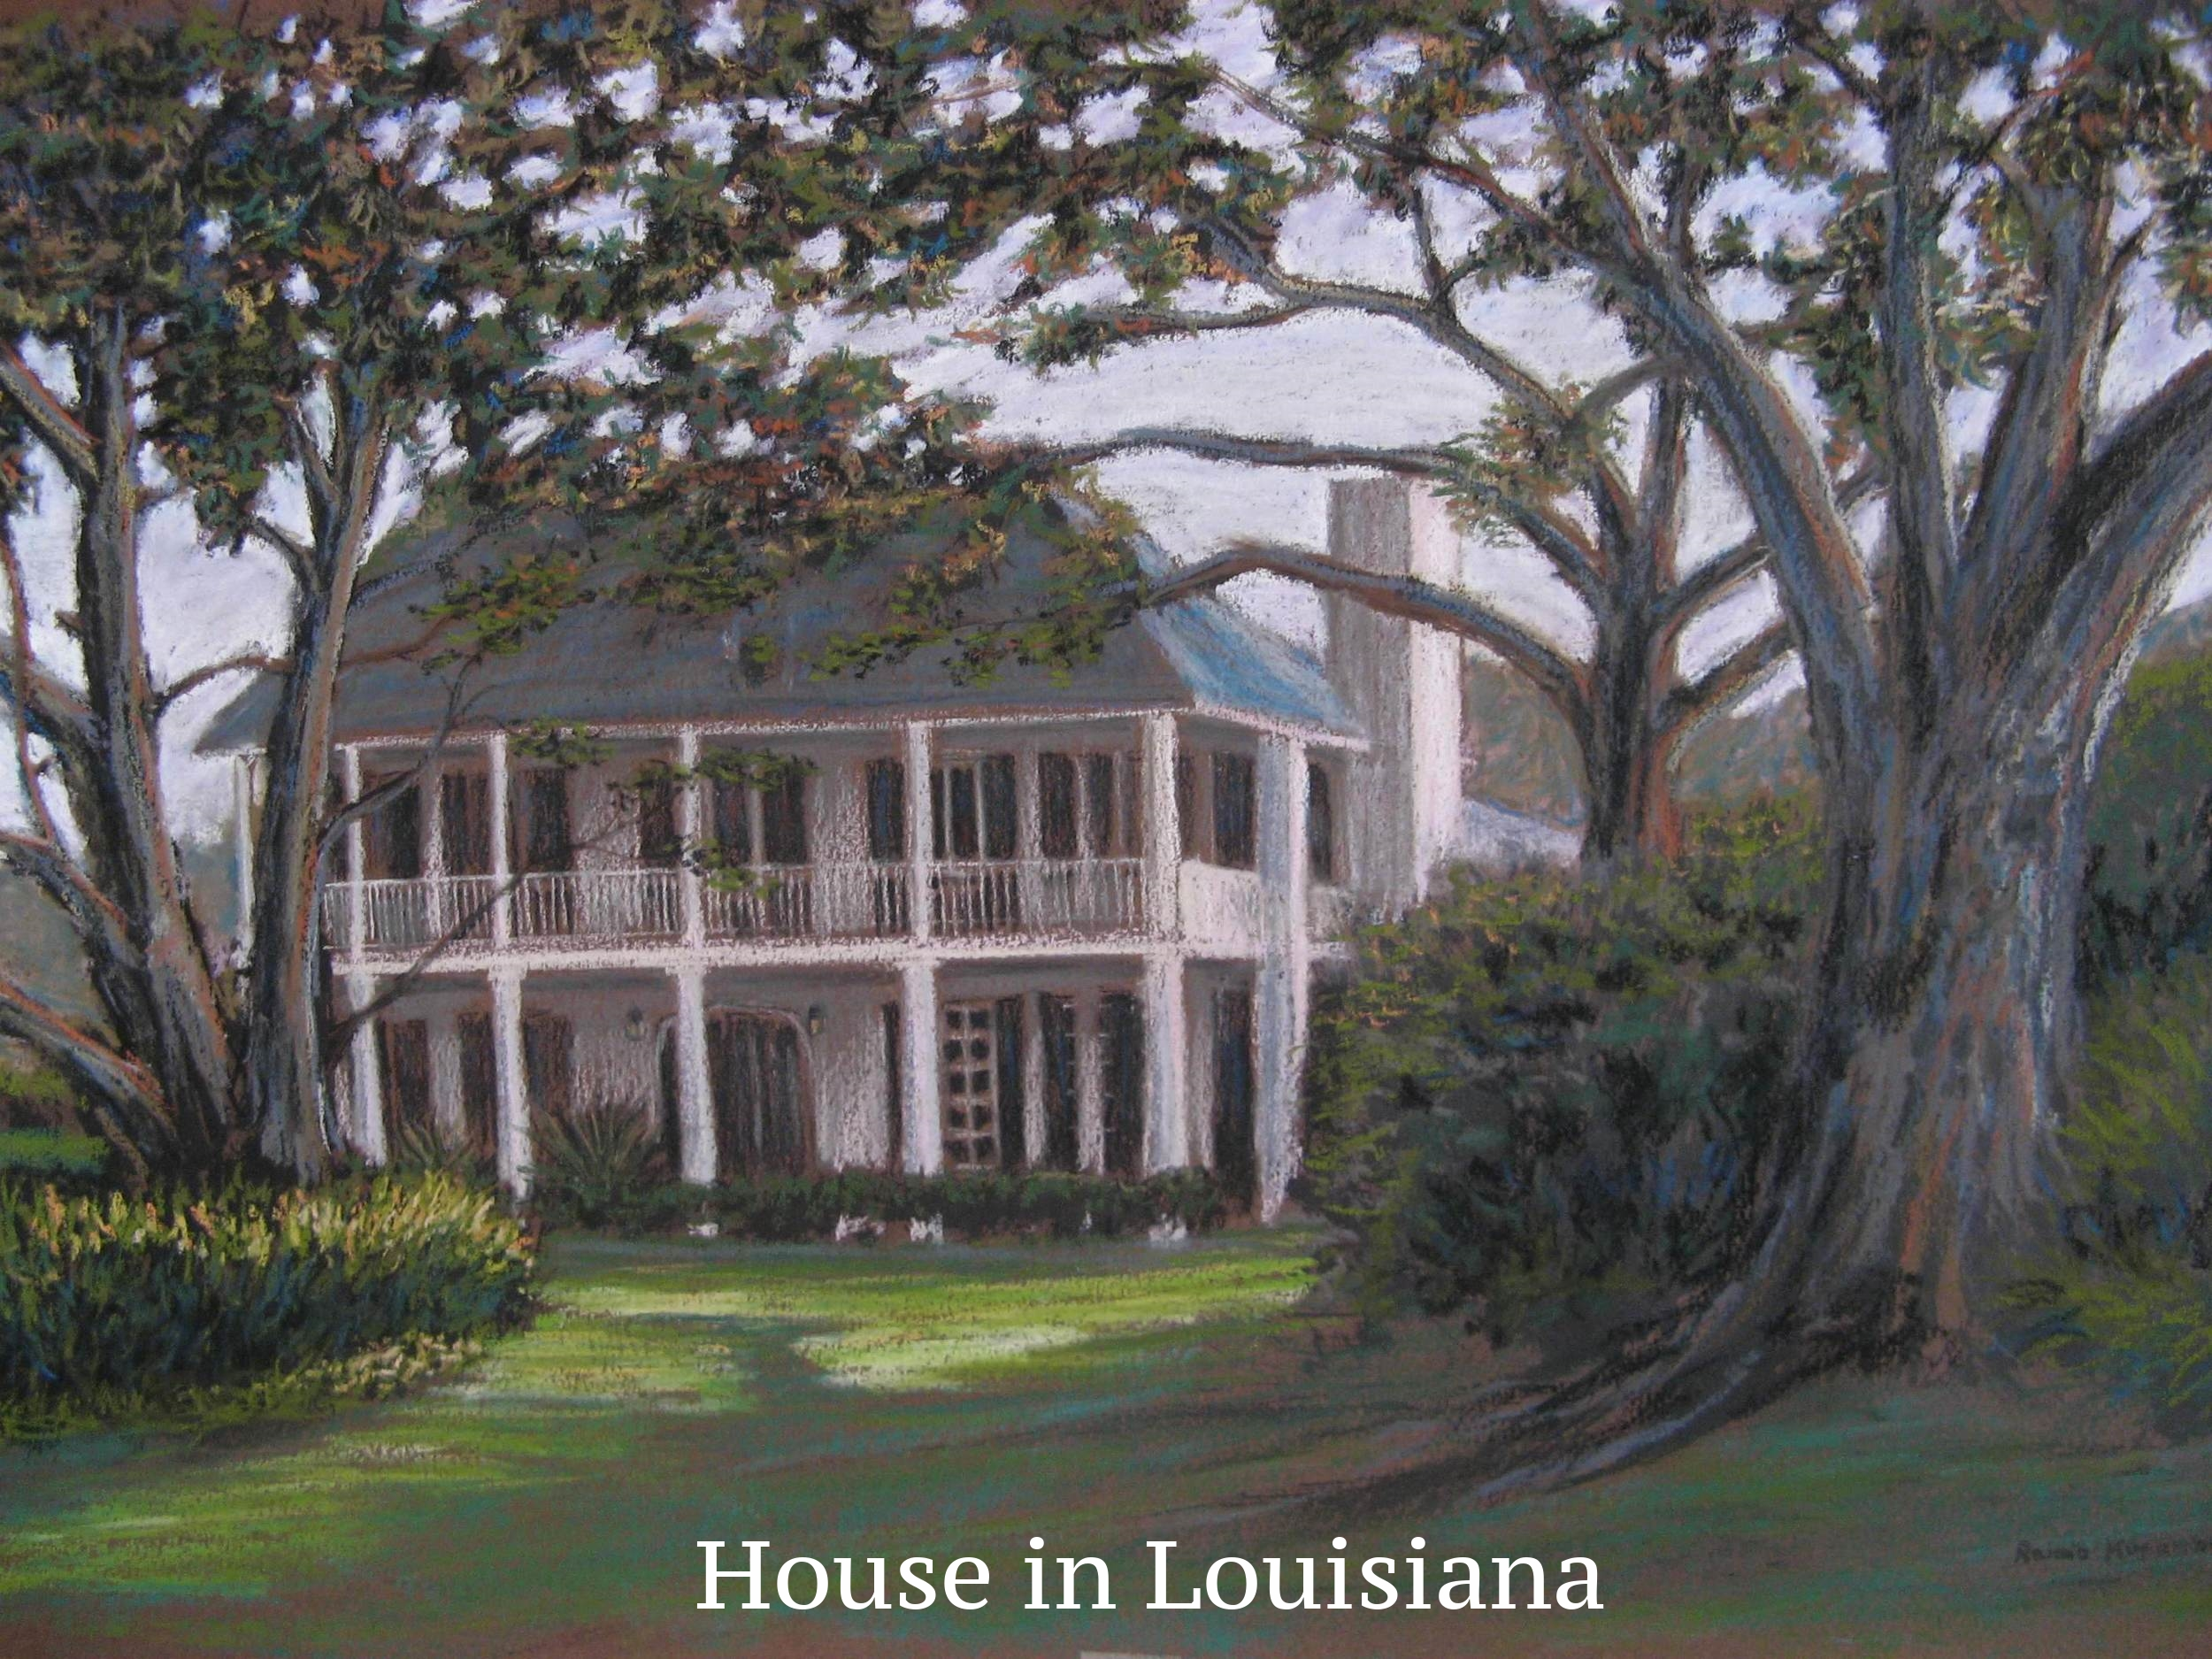 House in Louisiana, LSU lakes